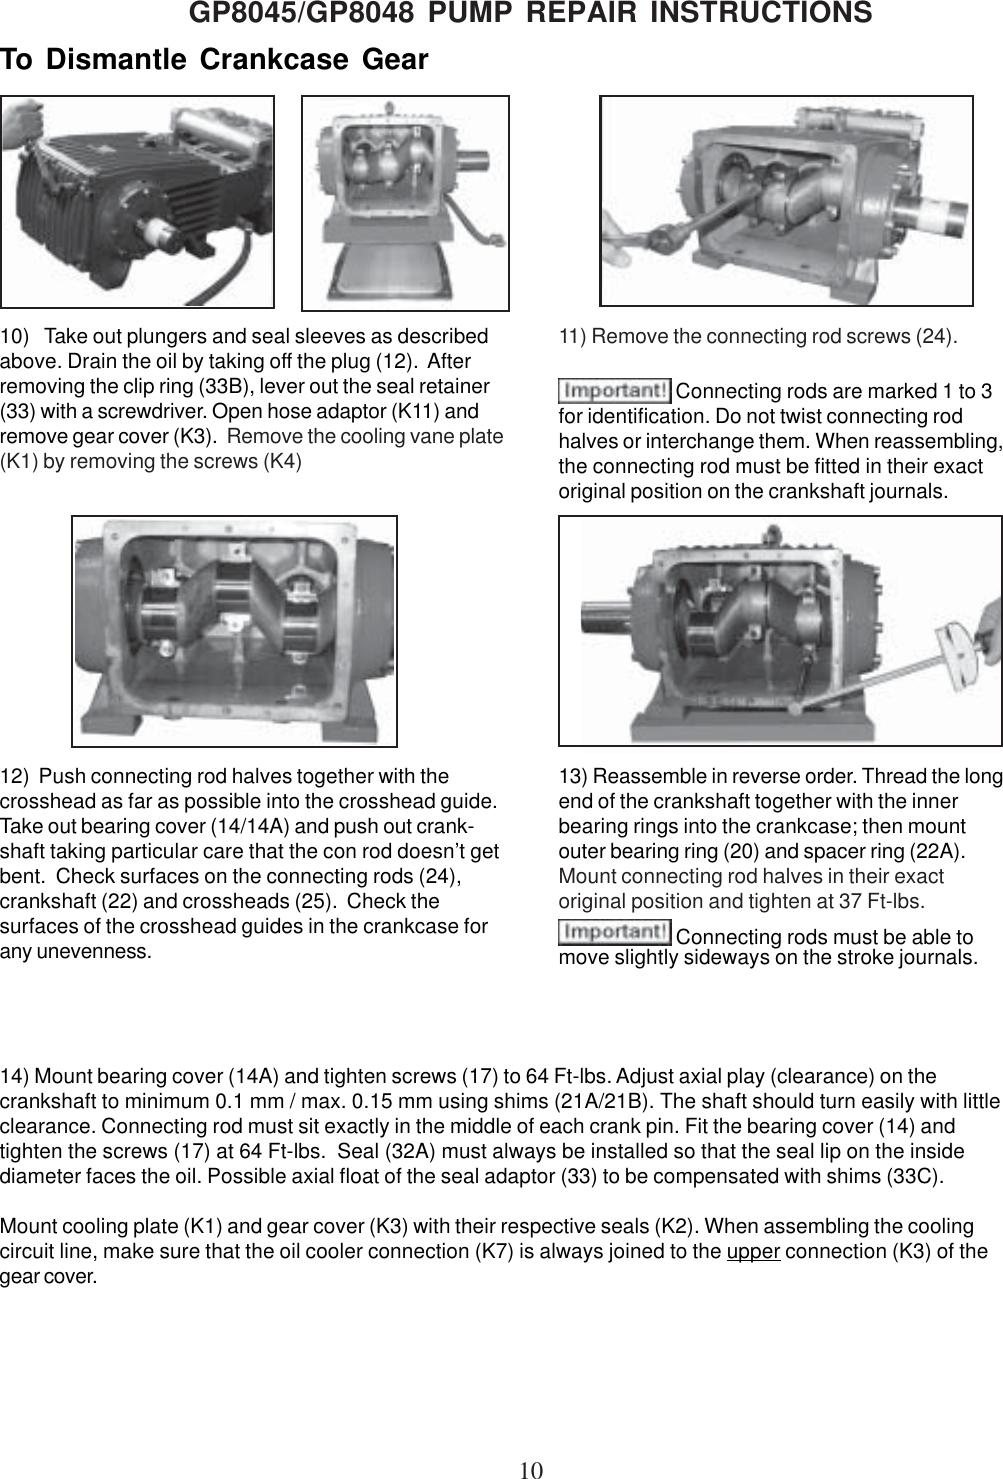 Giant Water Pump Gp8045 Users Manual GP8000